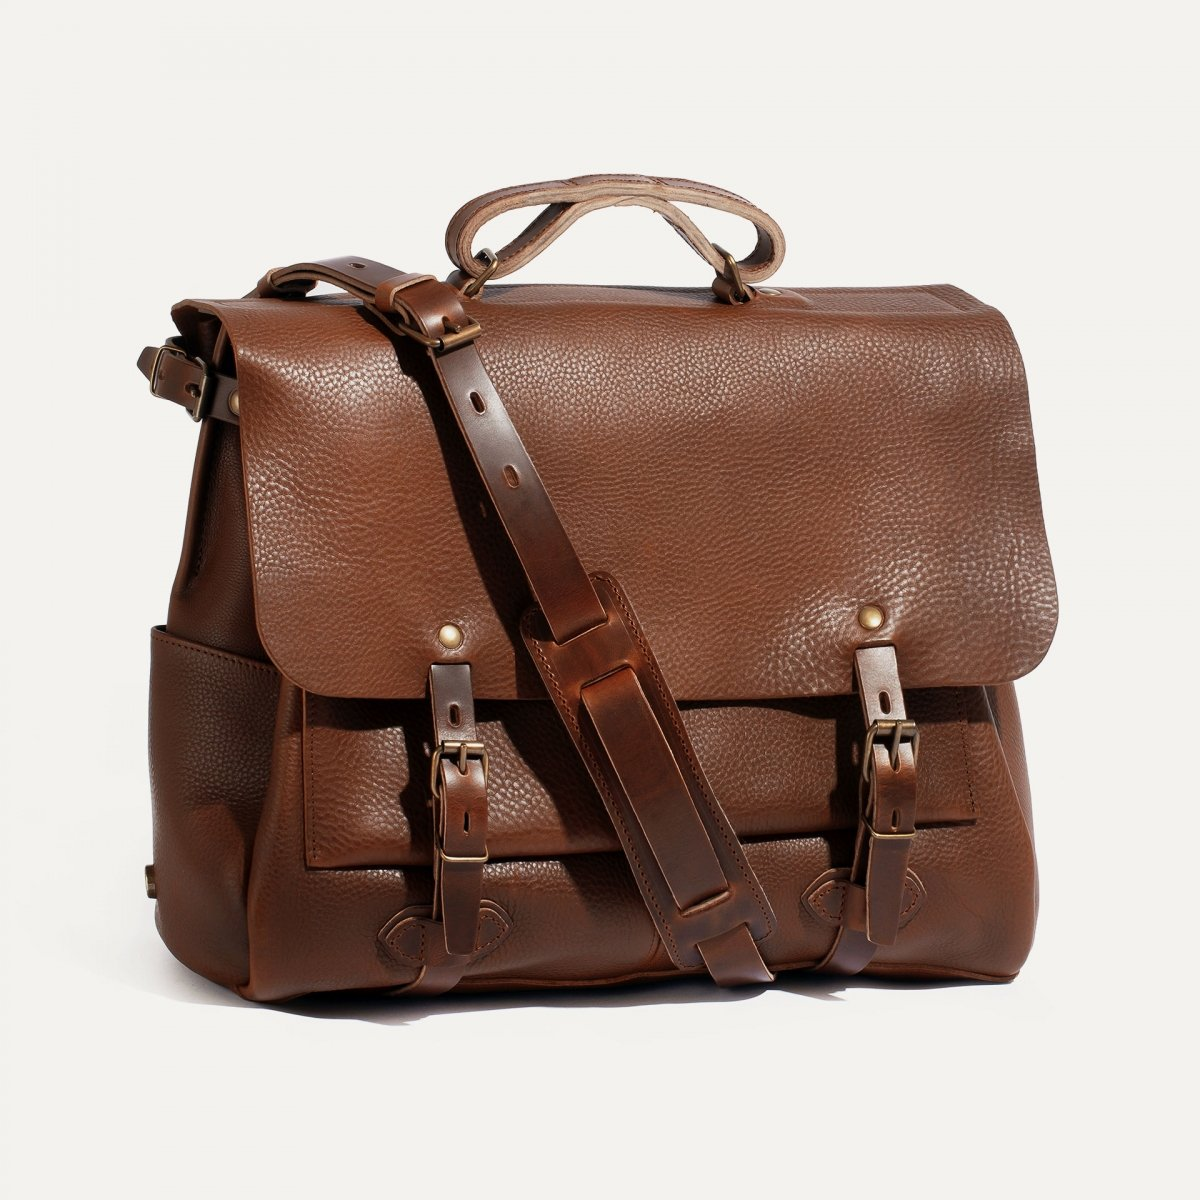 Executive Postman bag 48h Irving - Cuba Libre (image n°2)